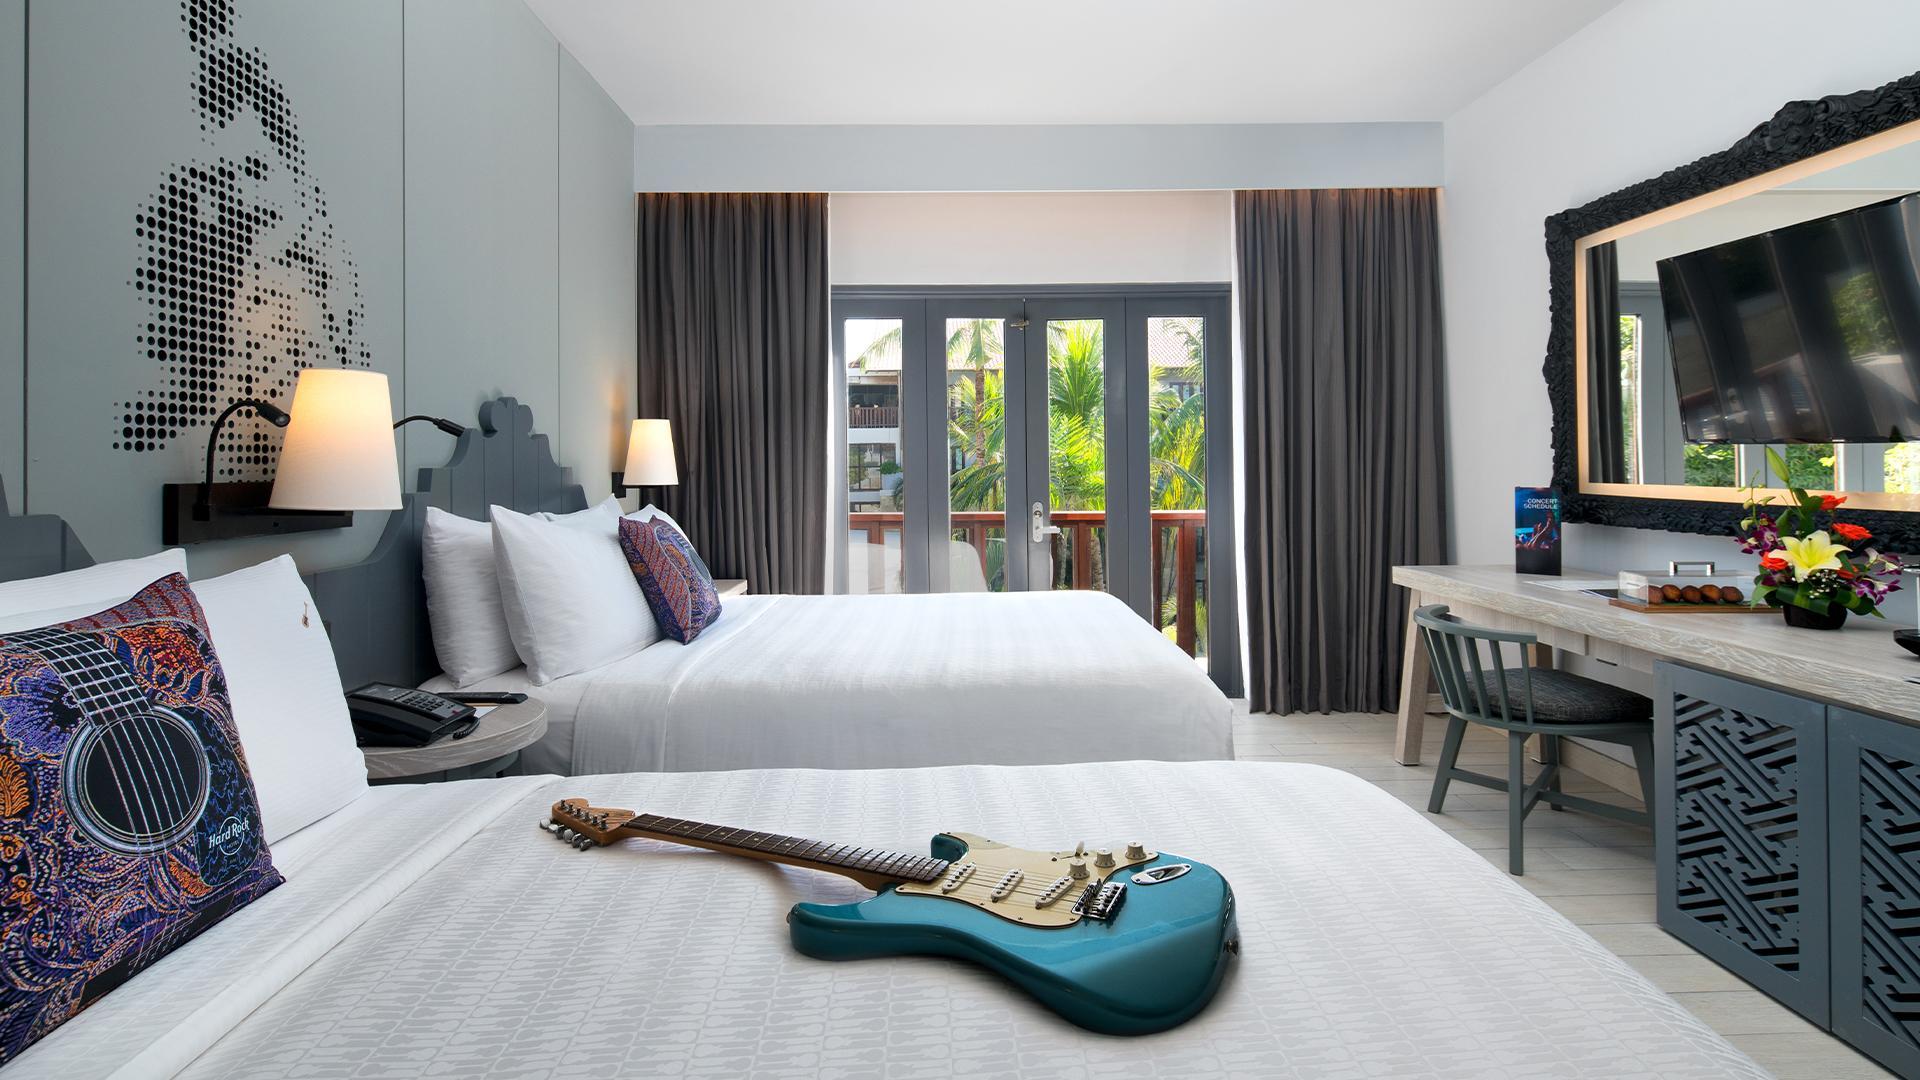 Rock Royalty Deluxe Premium Room image 1 at Hard Rock Hotel Bali by Kabupaten Badung, Bali, Indonesia